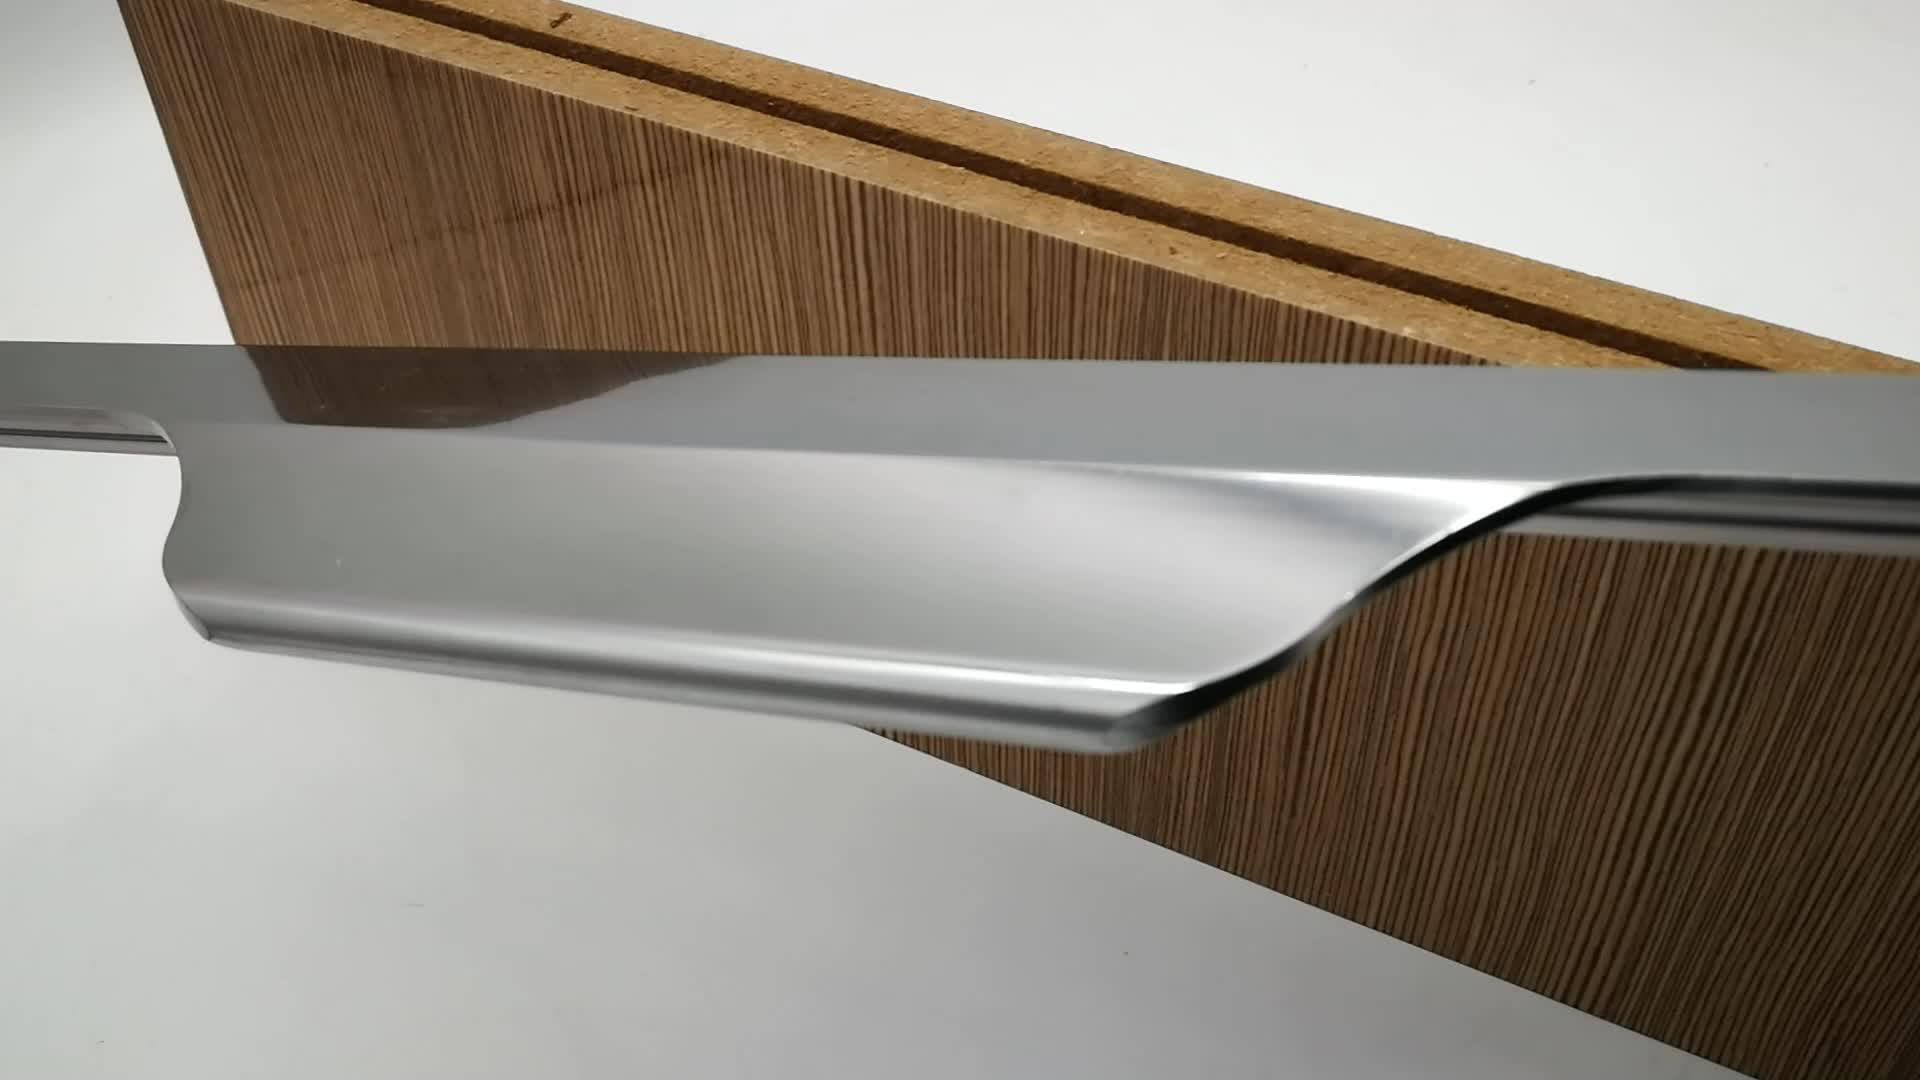 Modern aluminum profile handle for furniture hidden kitchen cabinet pull handle